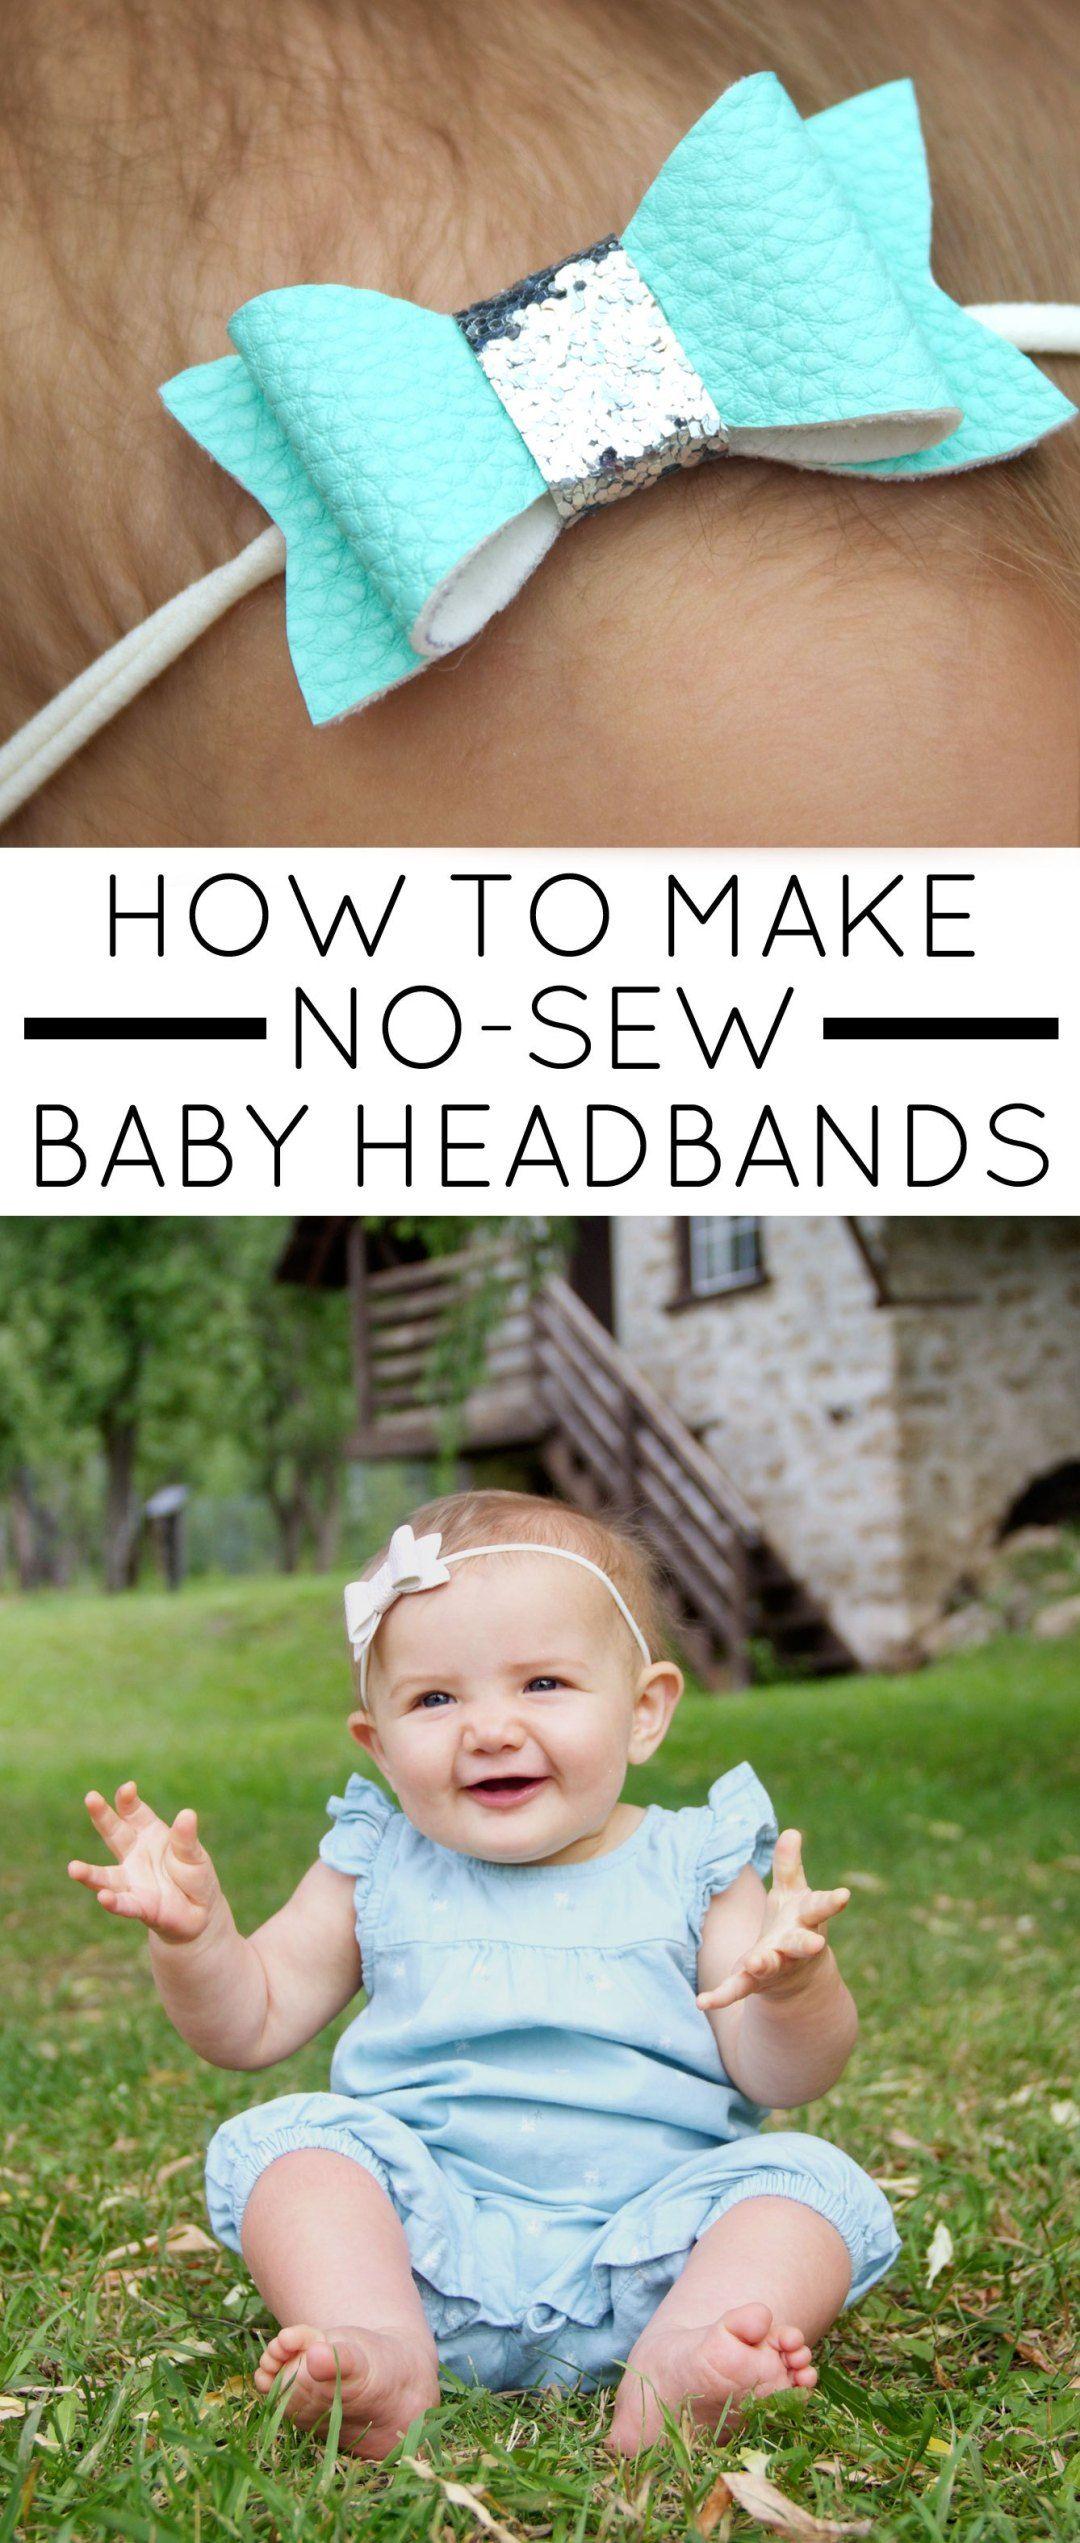 No-Sew Faux Leather Baby Headbands » Jessie K Design #diybabyheadbands